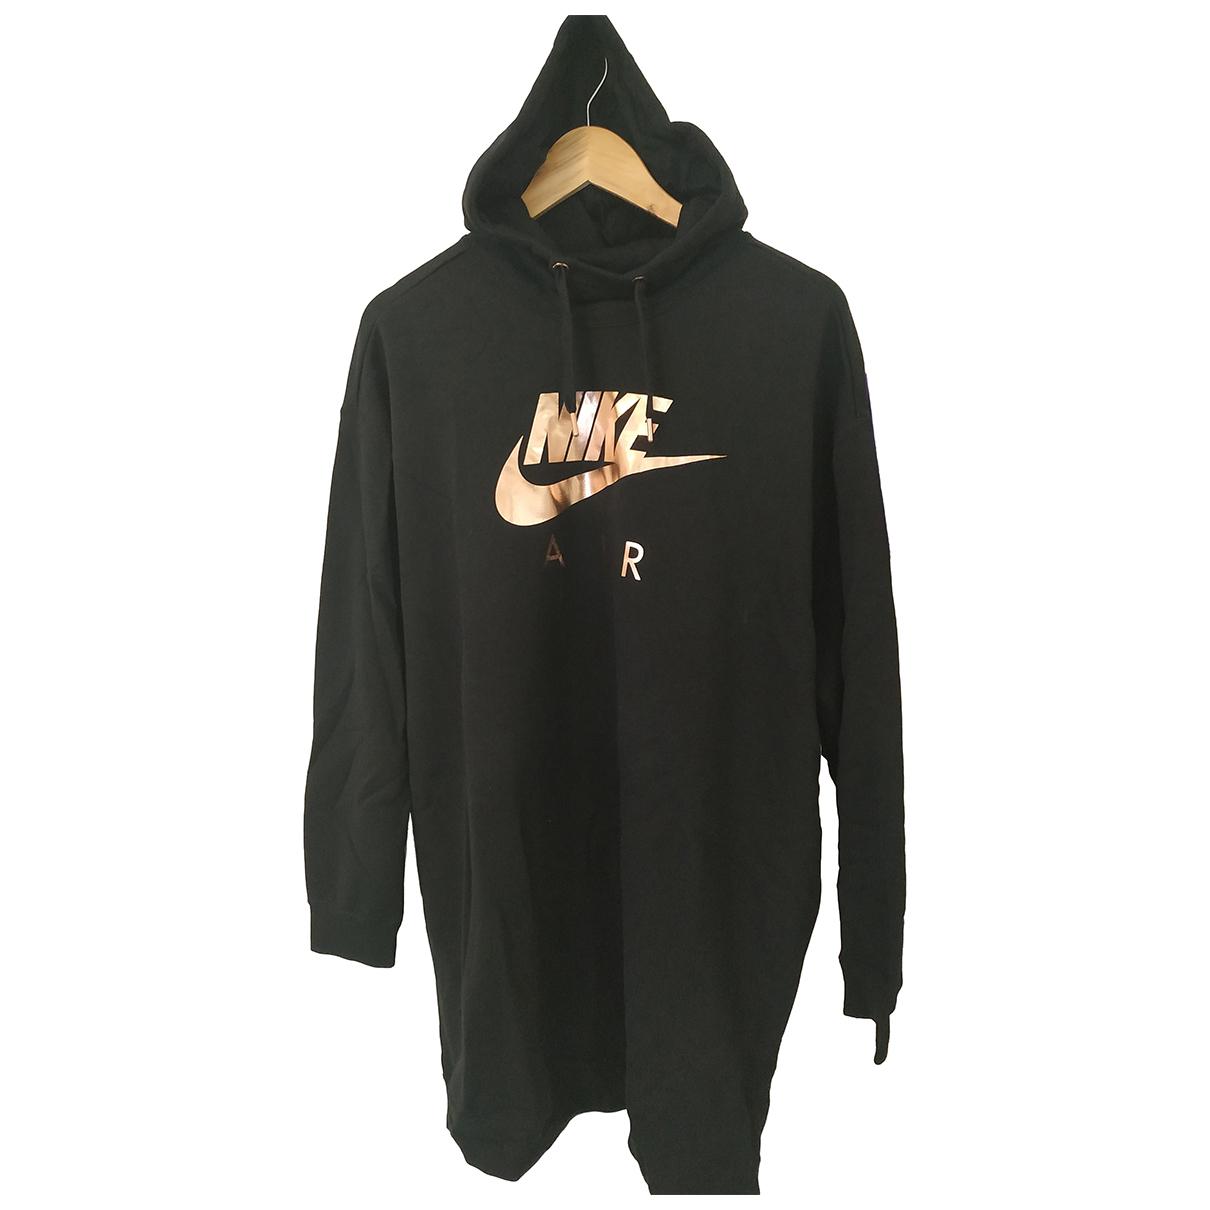 Vestido midi Nike